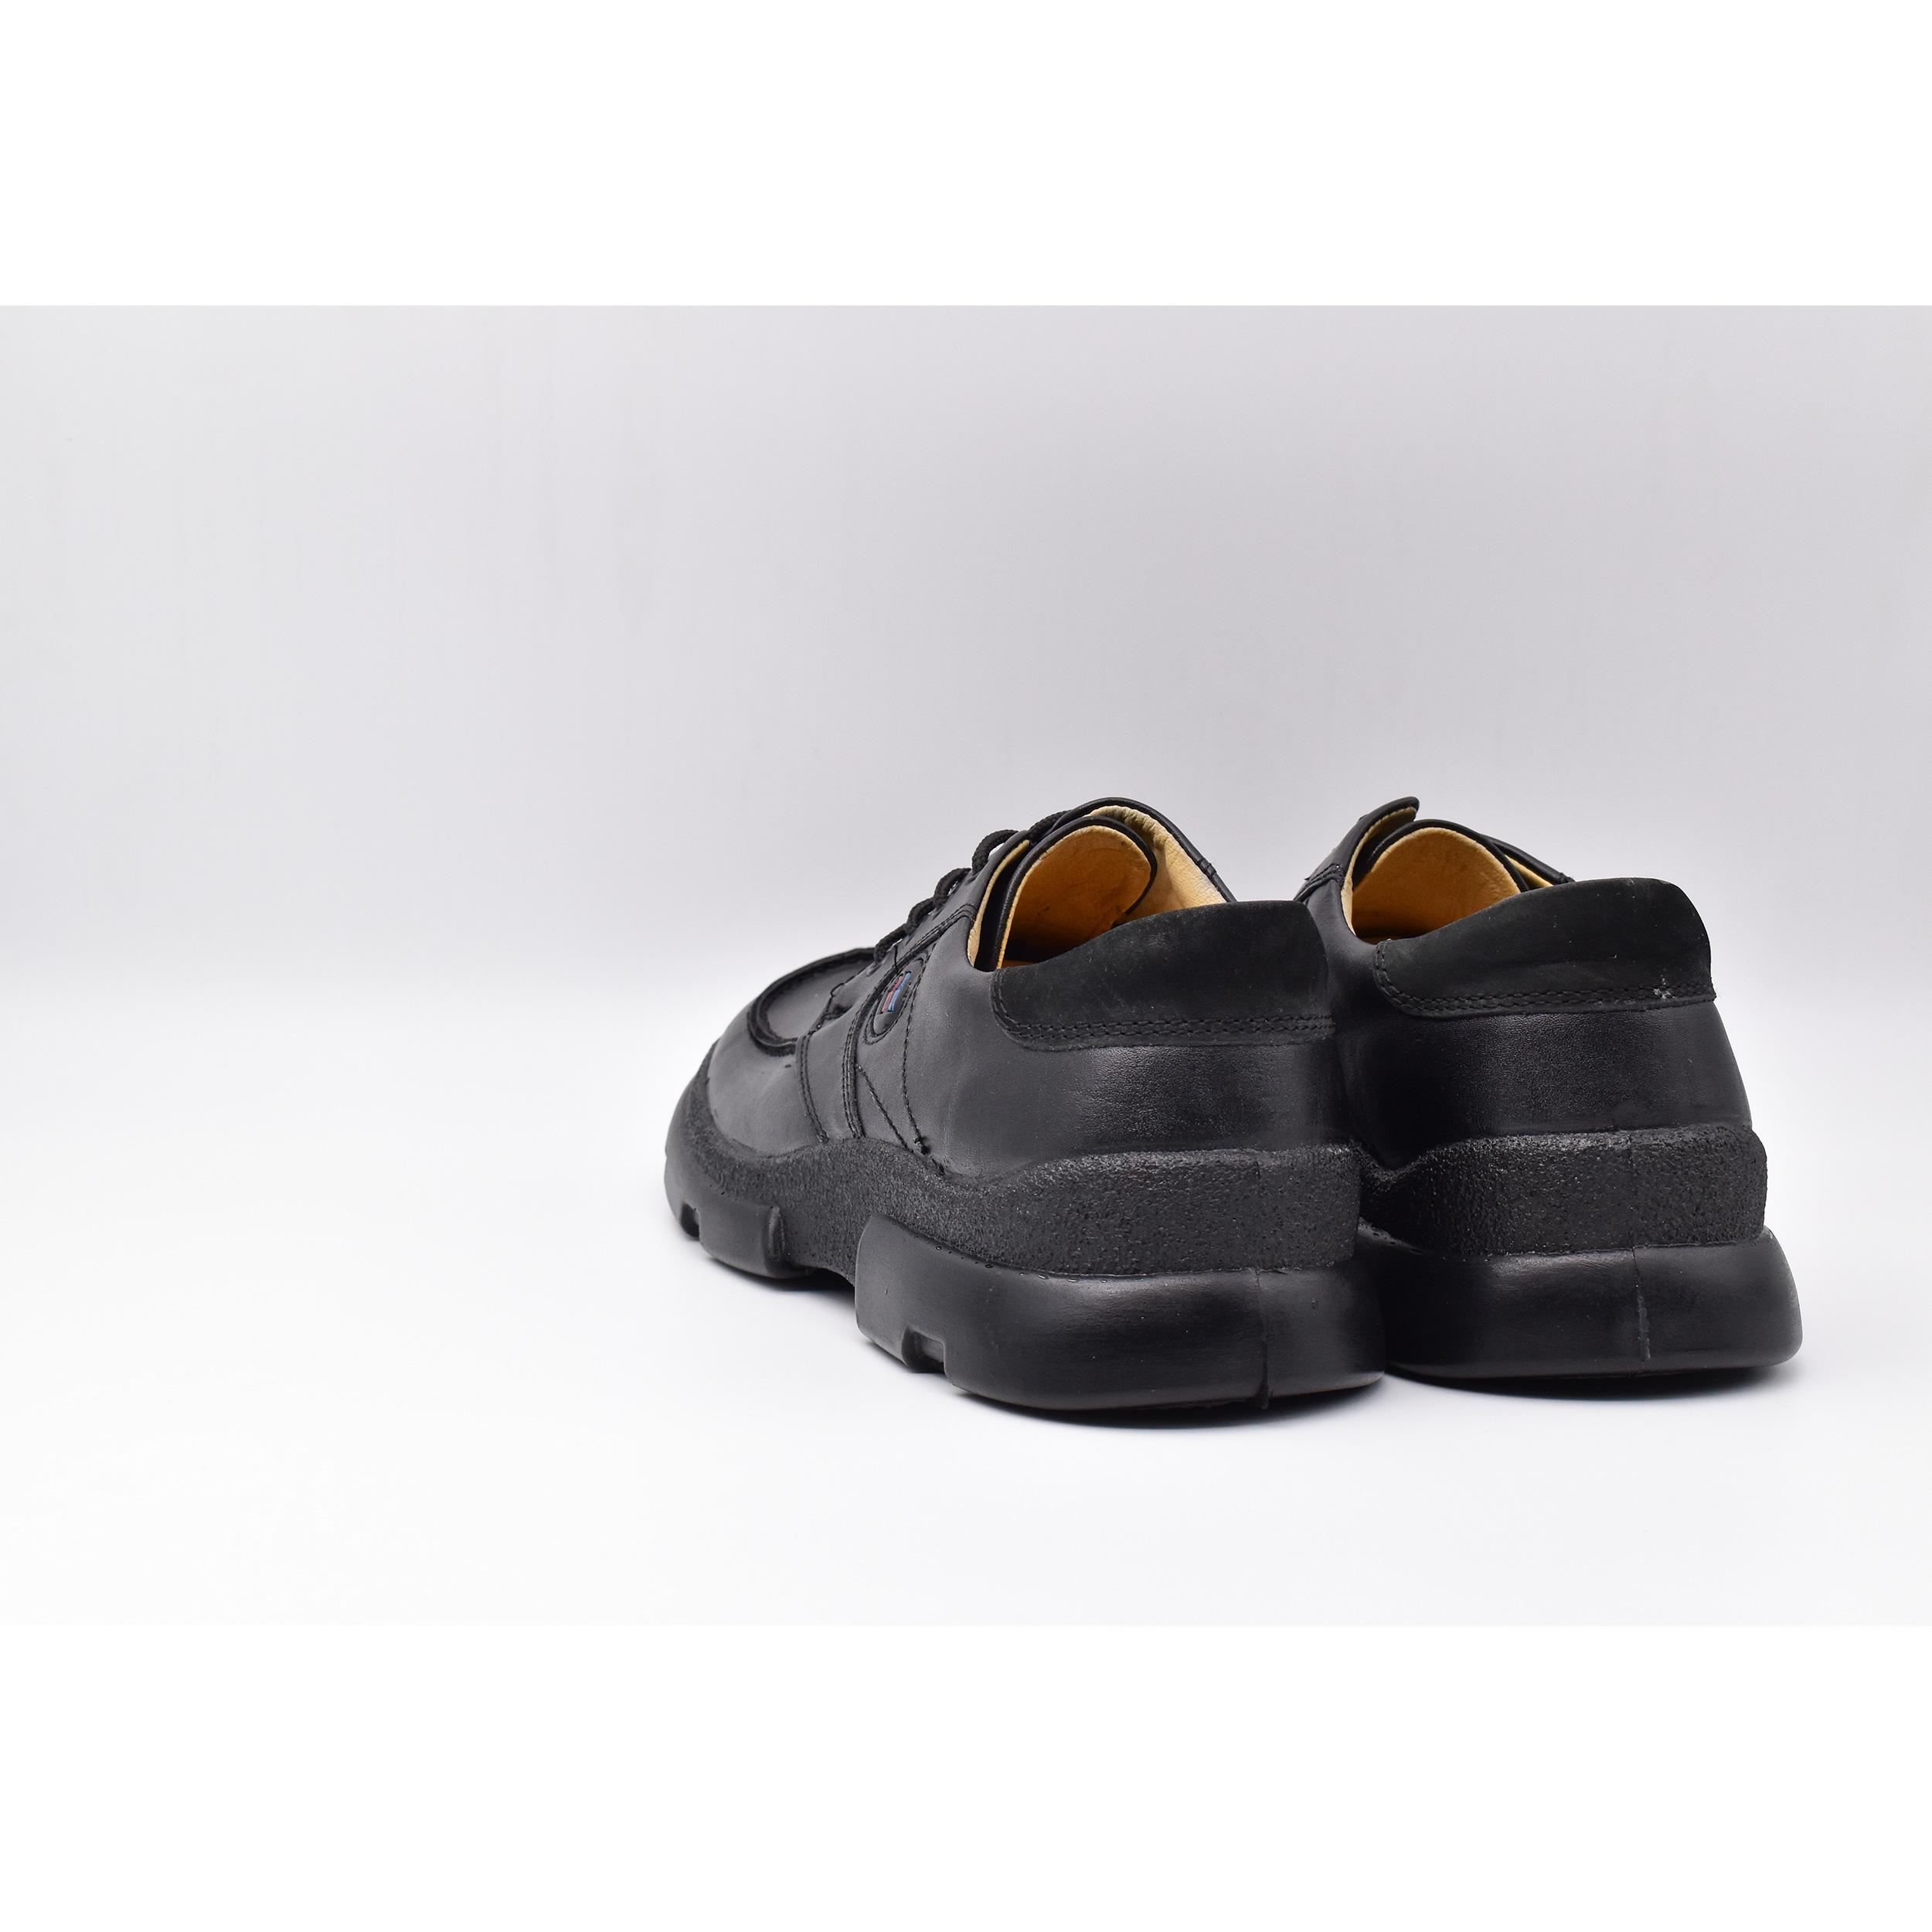 کفش روزمره مردانه البرز مدل تورنتو کد 7009 -  - 13